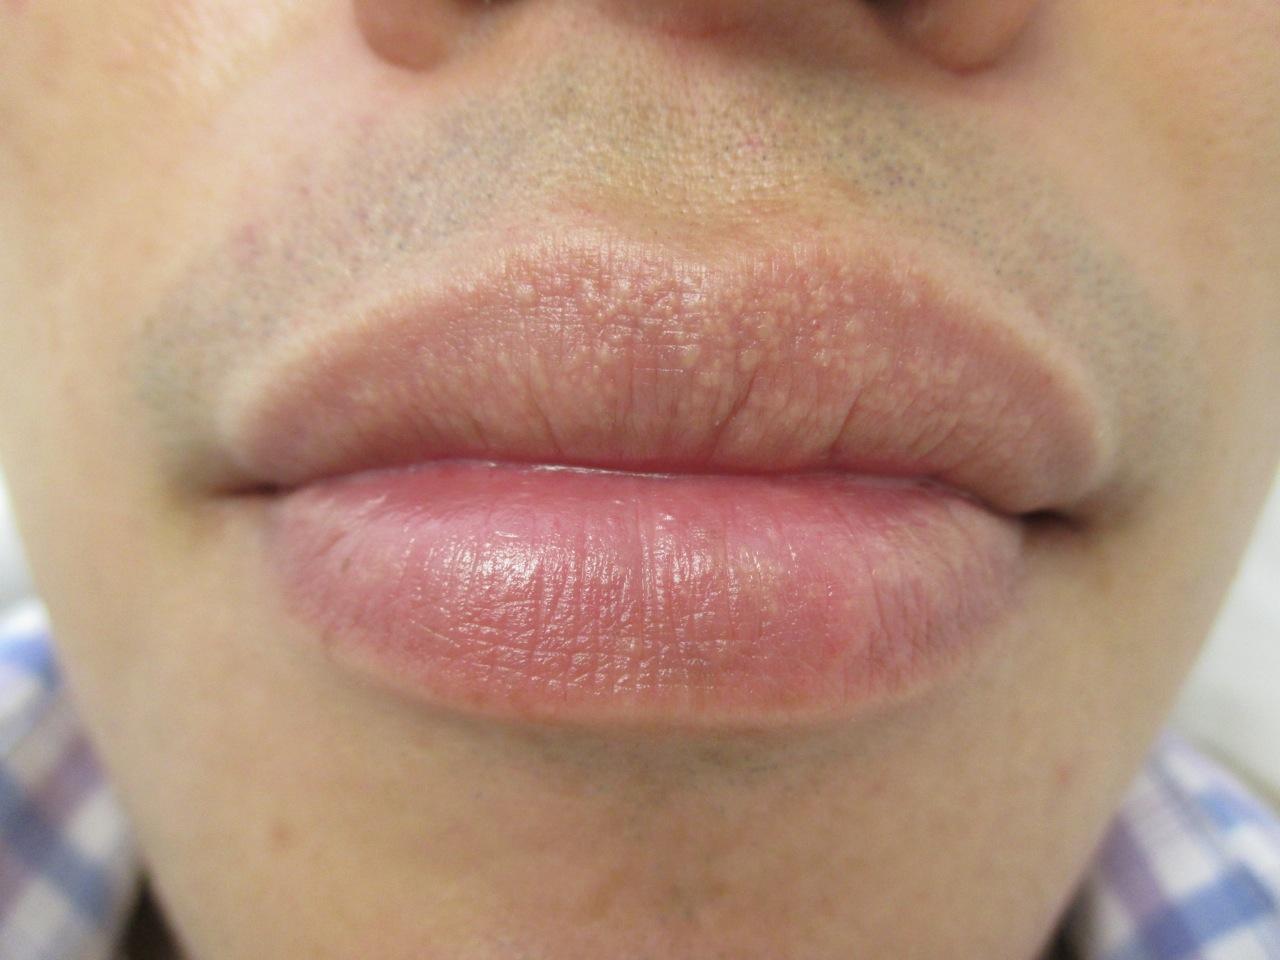 dark spot on my lip - pictures, photos